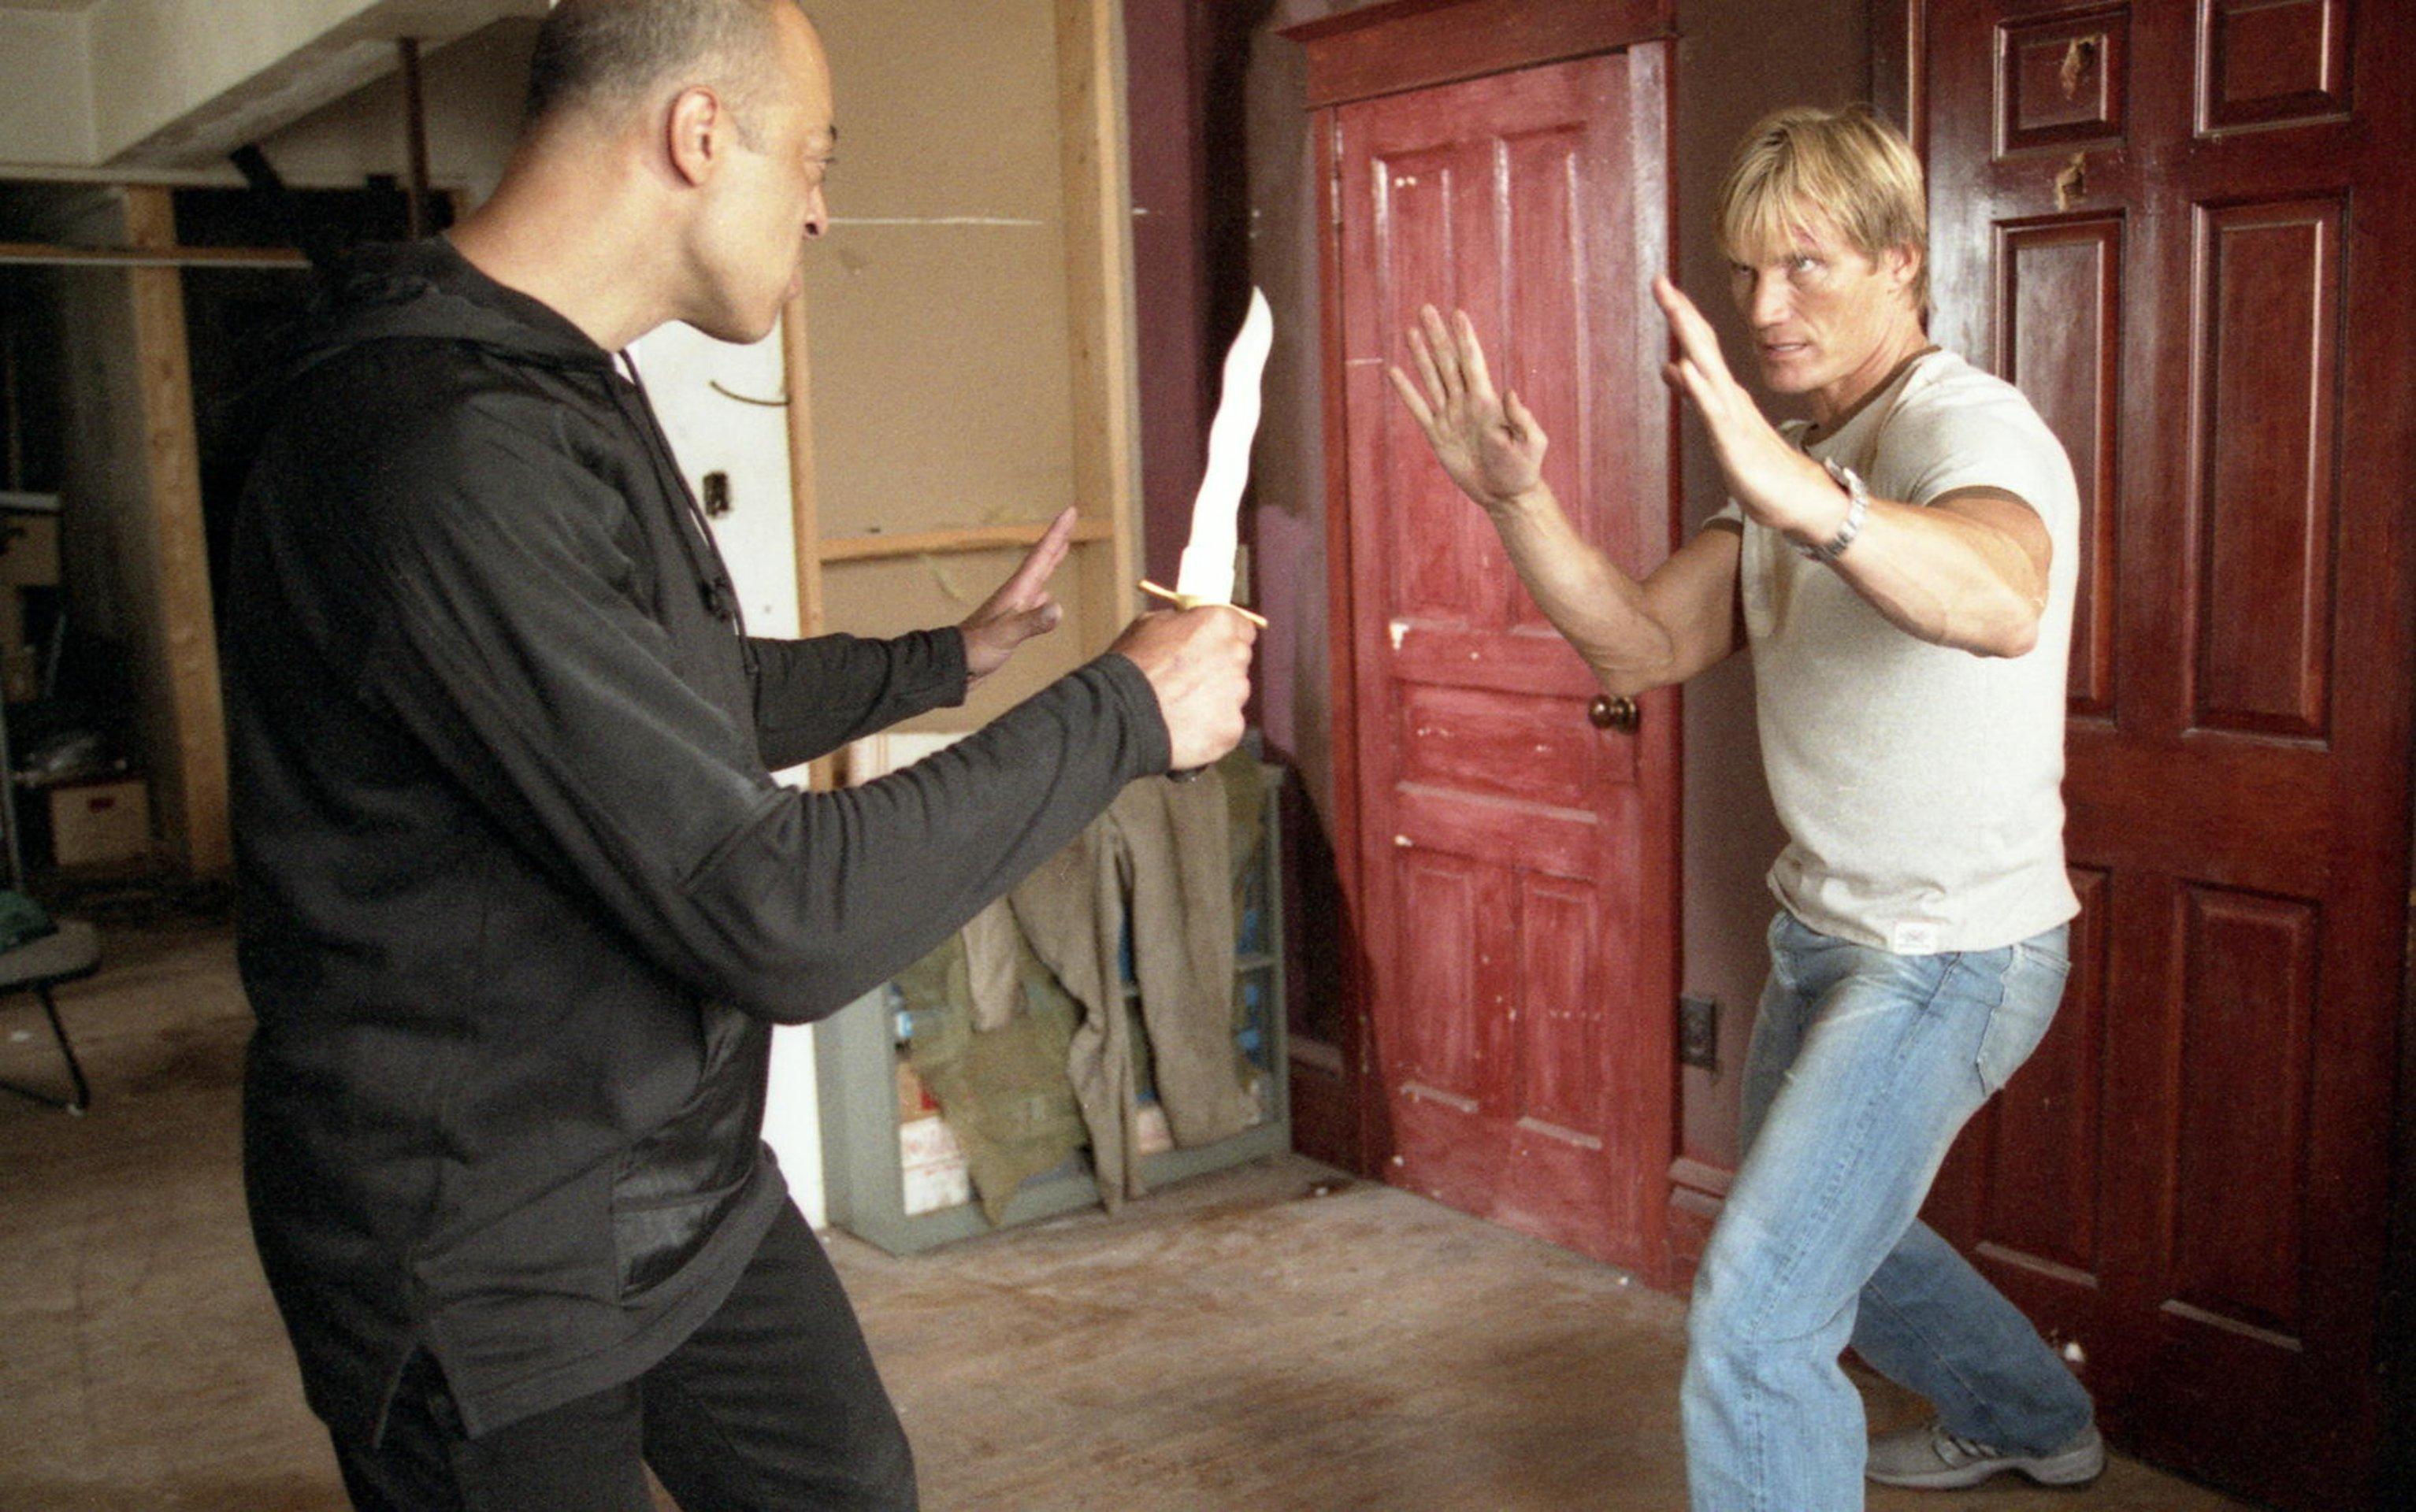 Dolph Lundgren in Direct Action (2004)